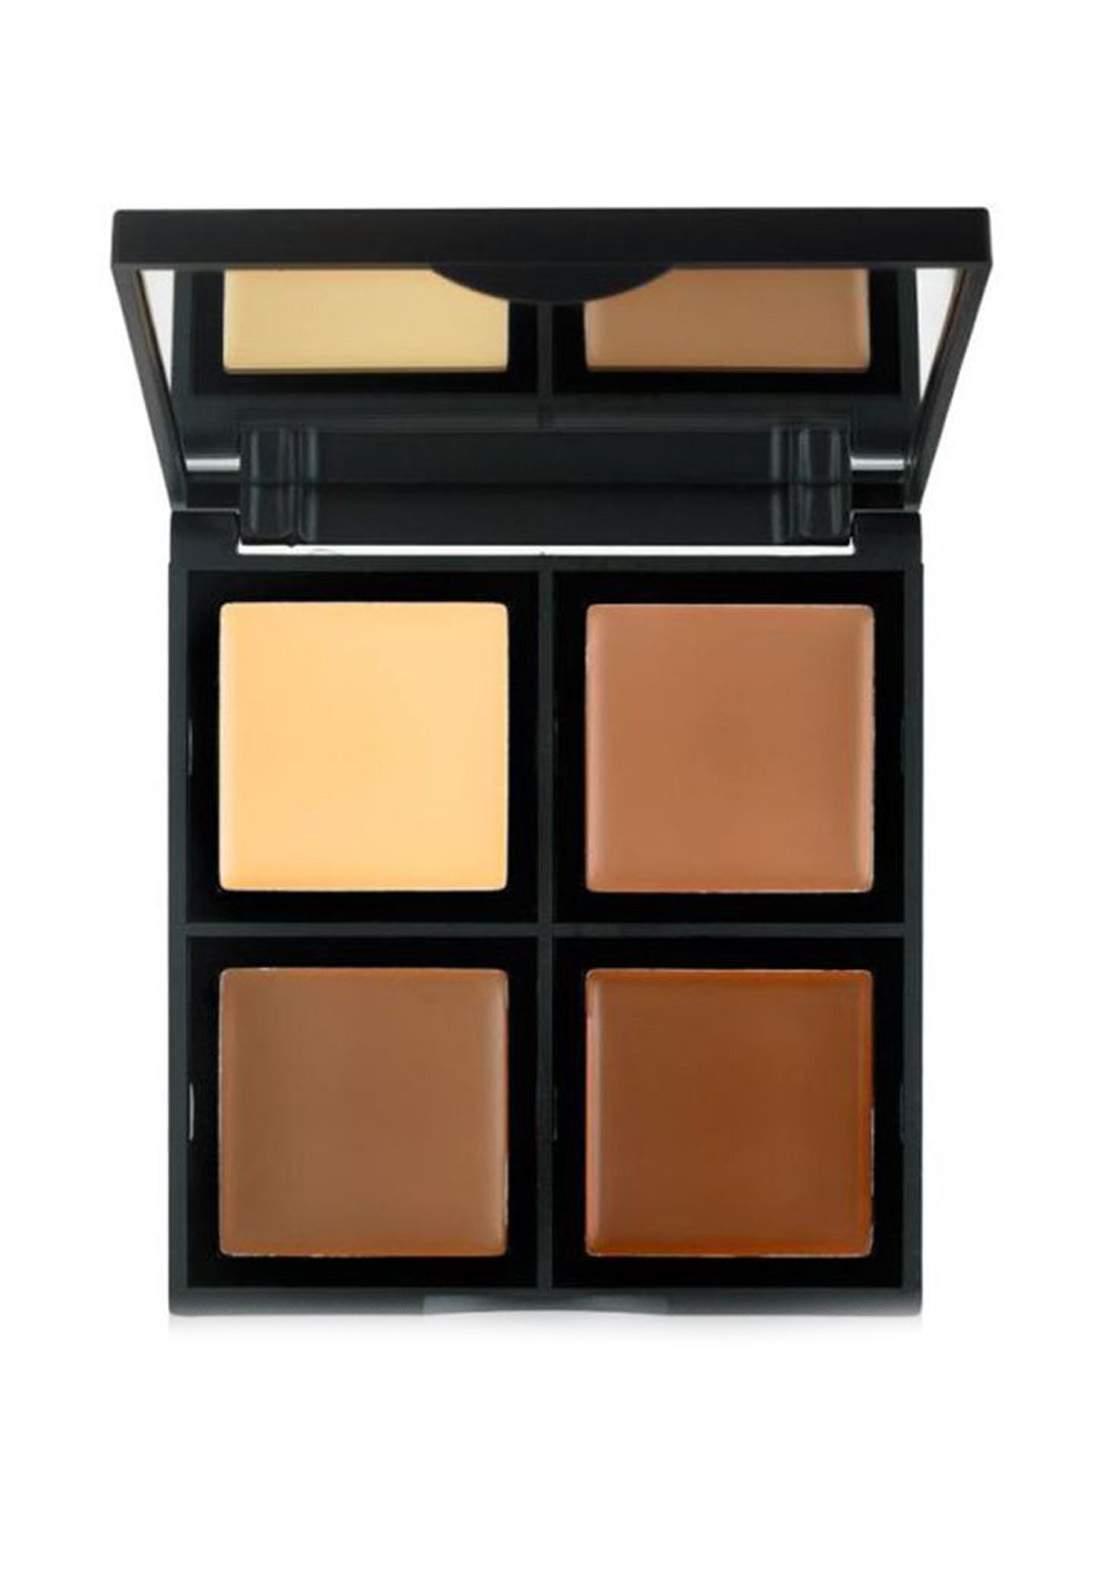 Elf Cream Contour Palette 12.4g باليت تحديد ملامح الوجه